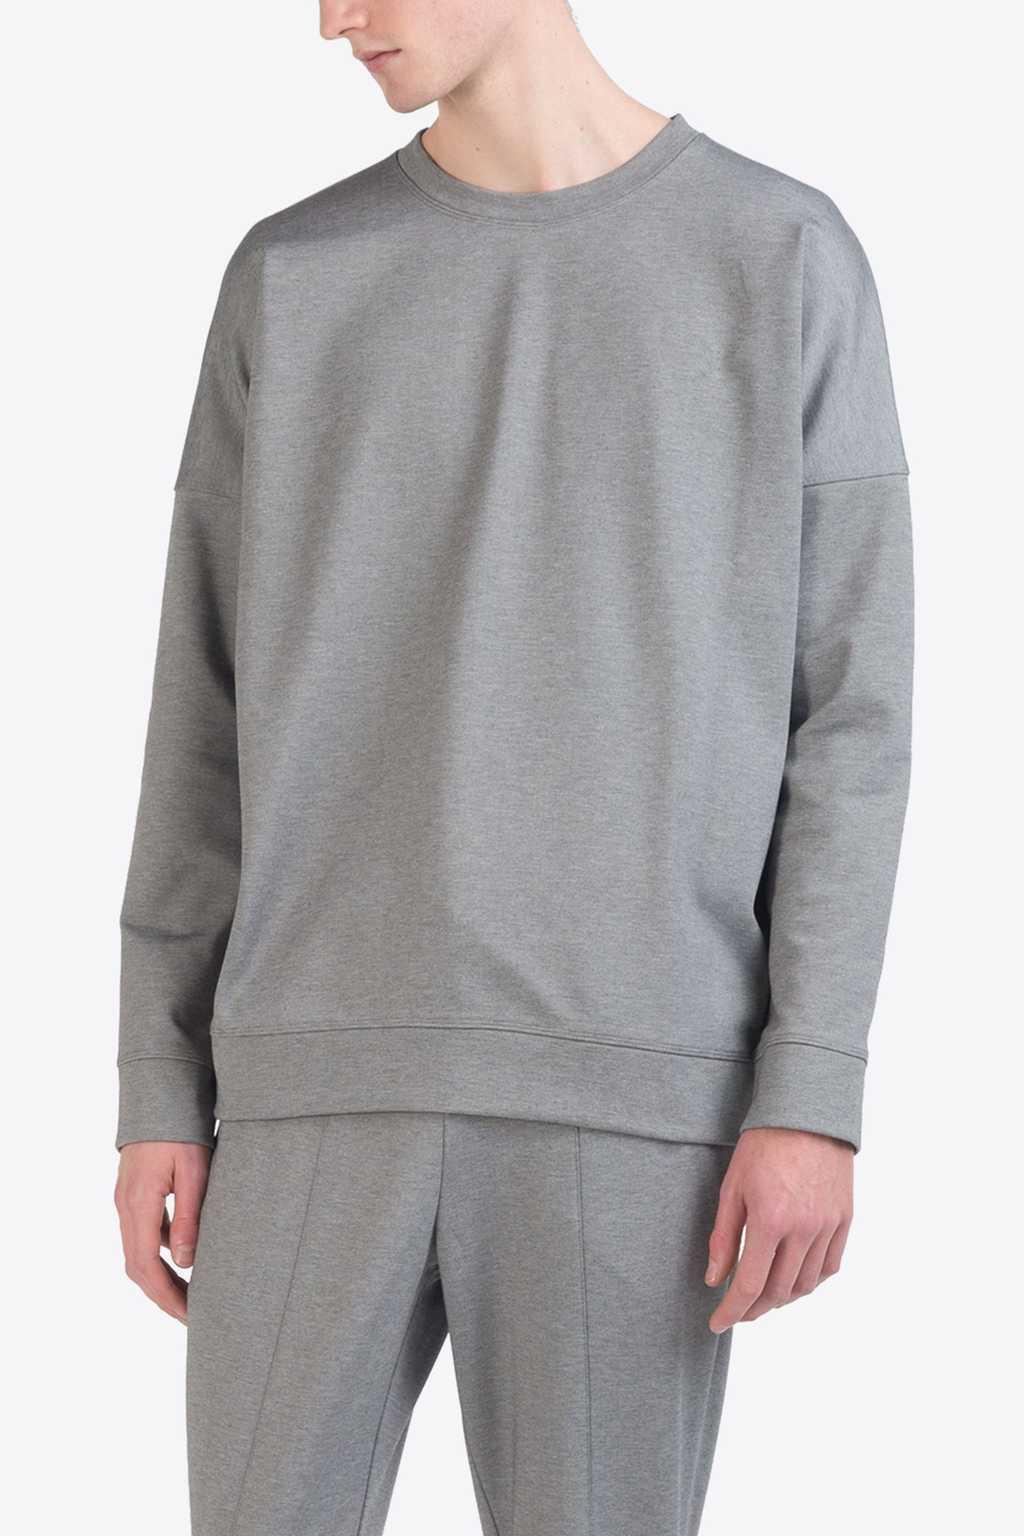 T Shirt 1206 Gray 6